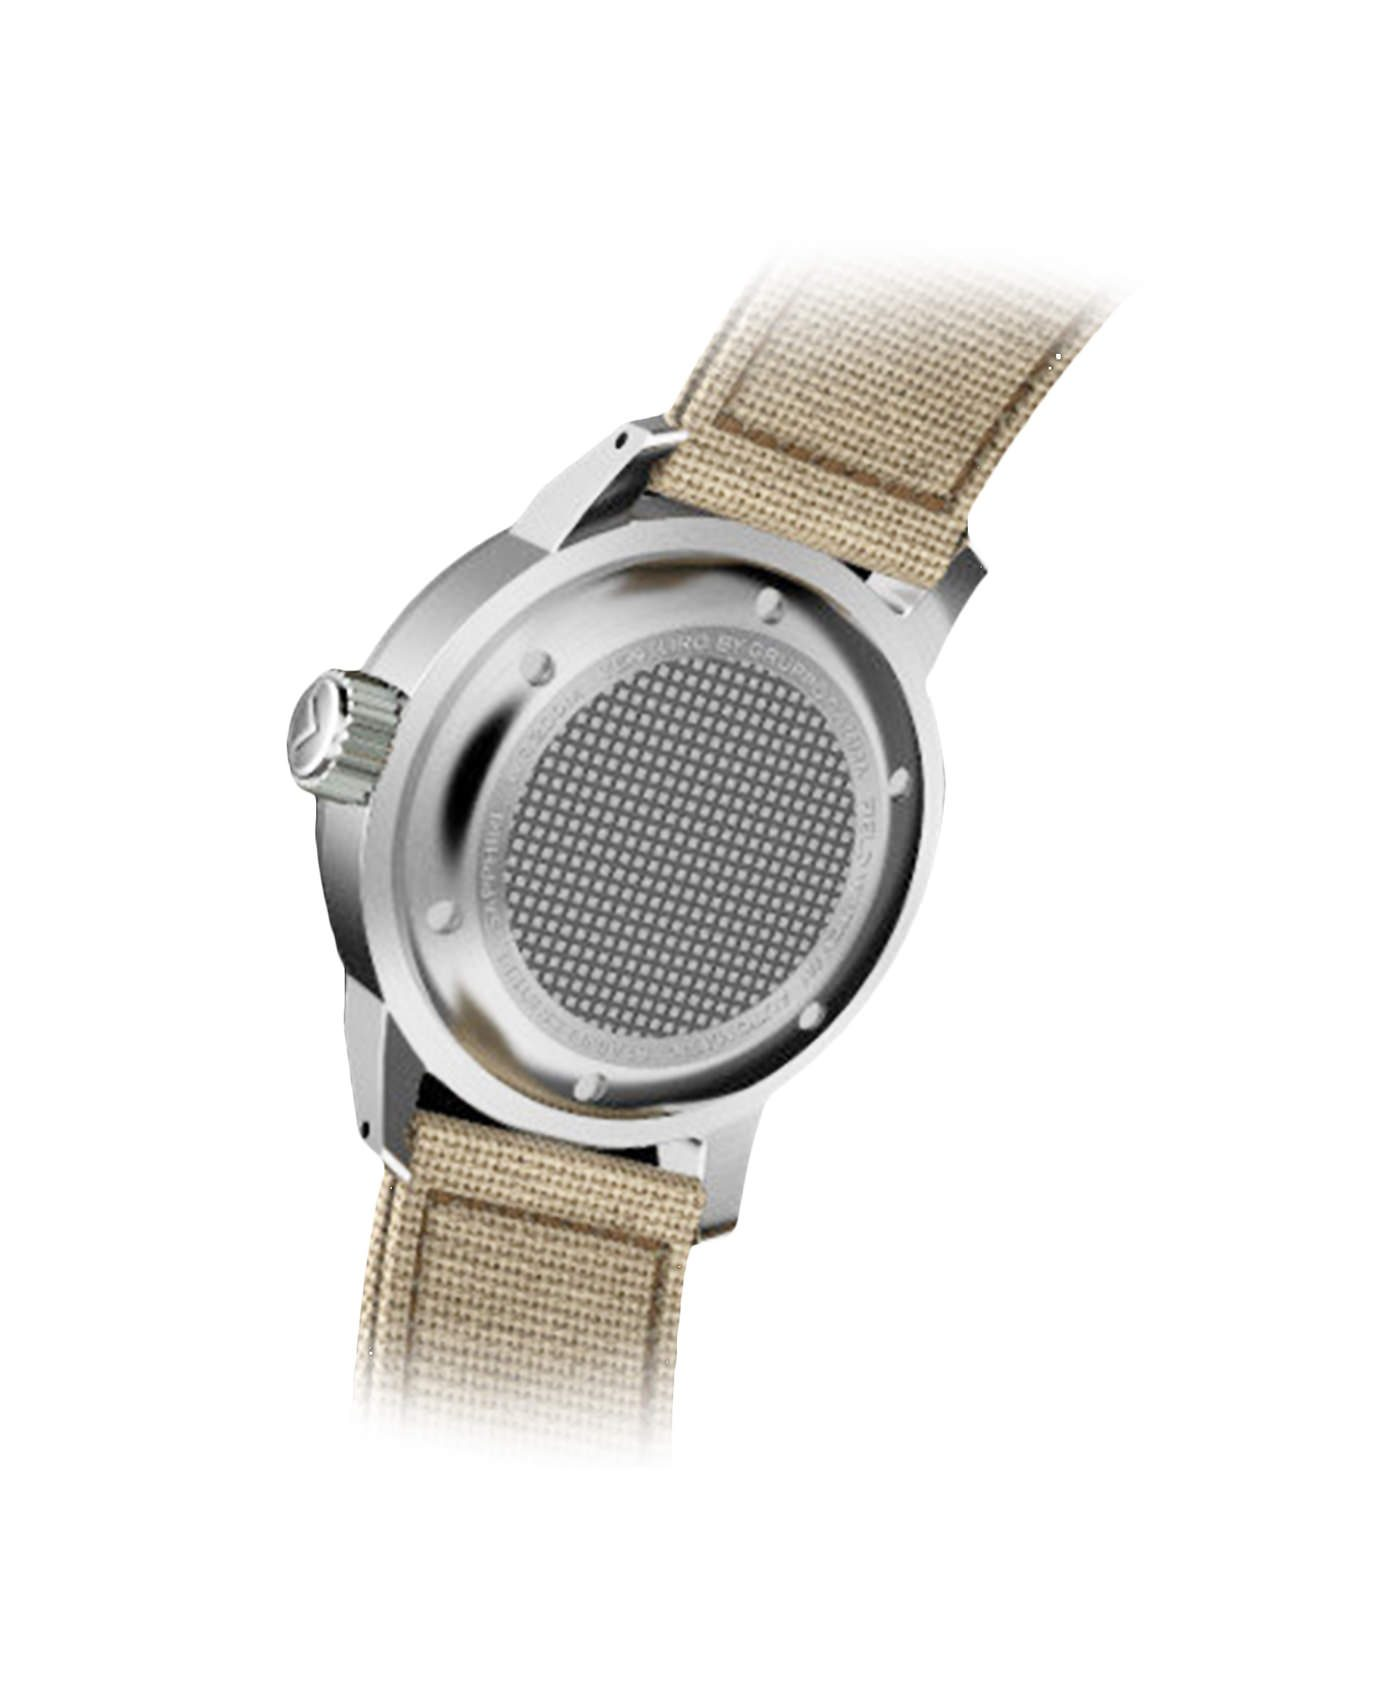 WB_Venturo - Field Watch - Cream Full Lume Dial-back